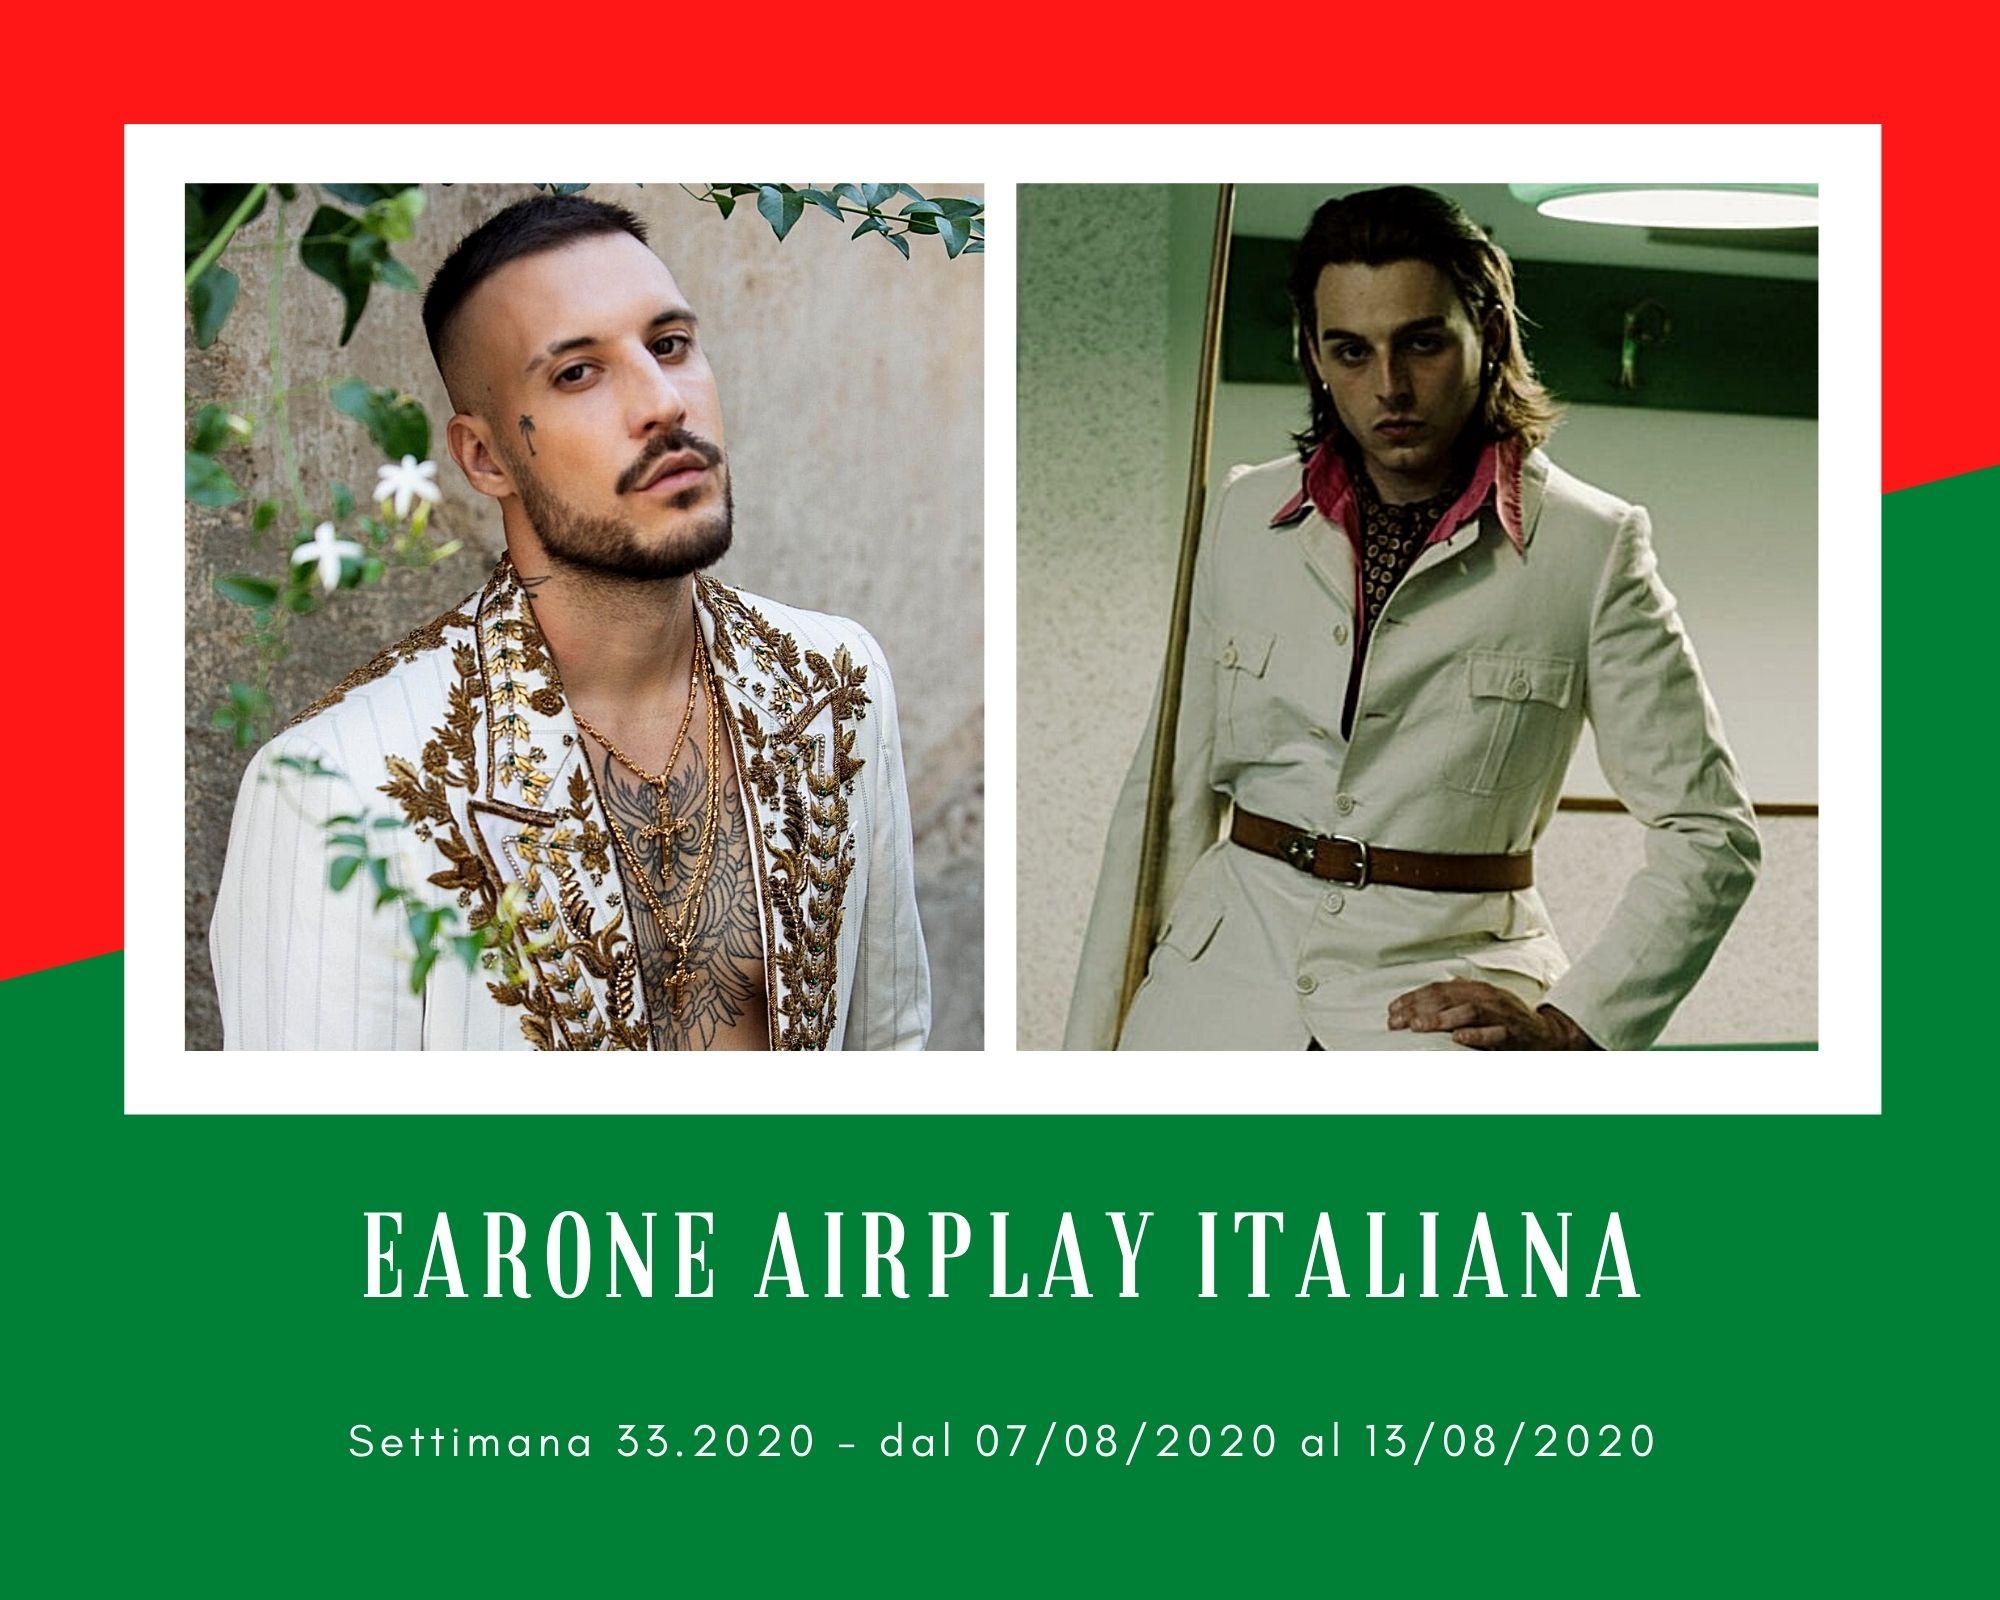 Classifica Radio EarOne Airplay Italiana, week 33: Fred De Palma ritorna in top 10 con Anitta, Mahmood si sdoppia e Ernia spopola